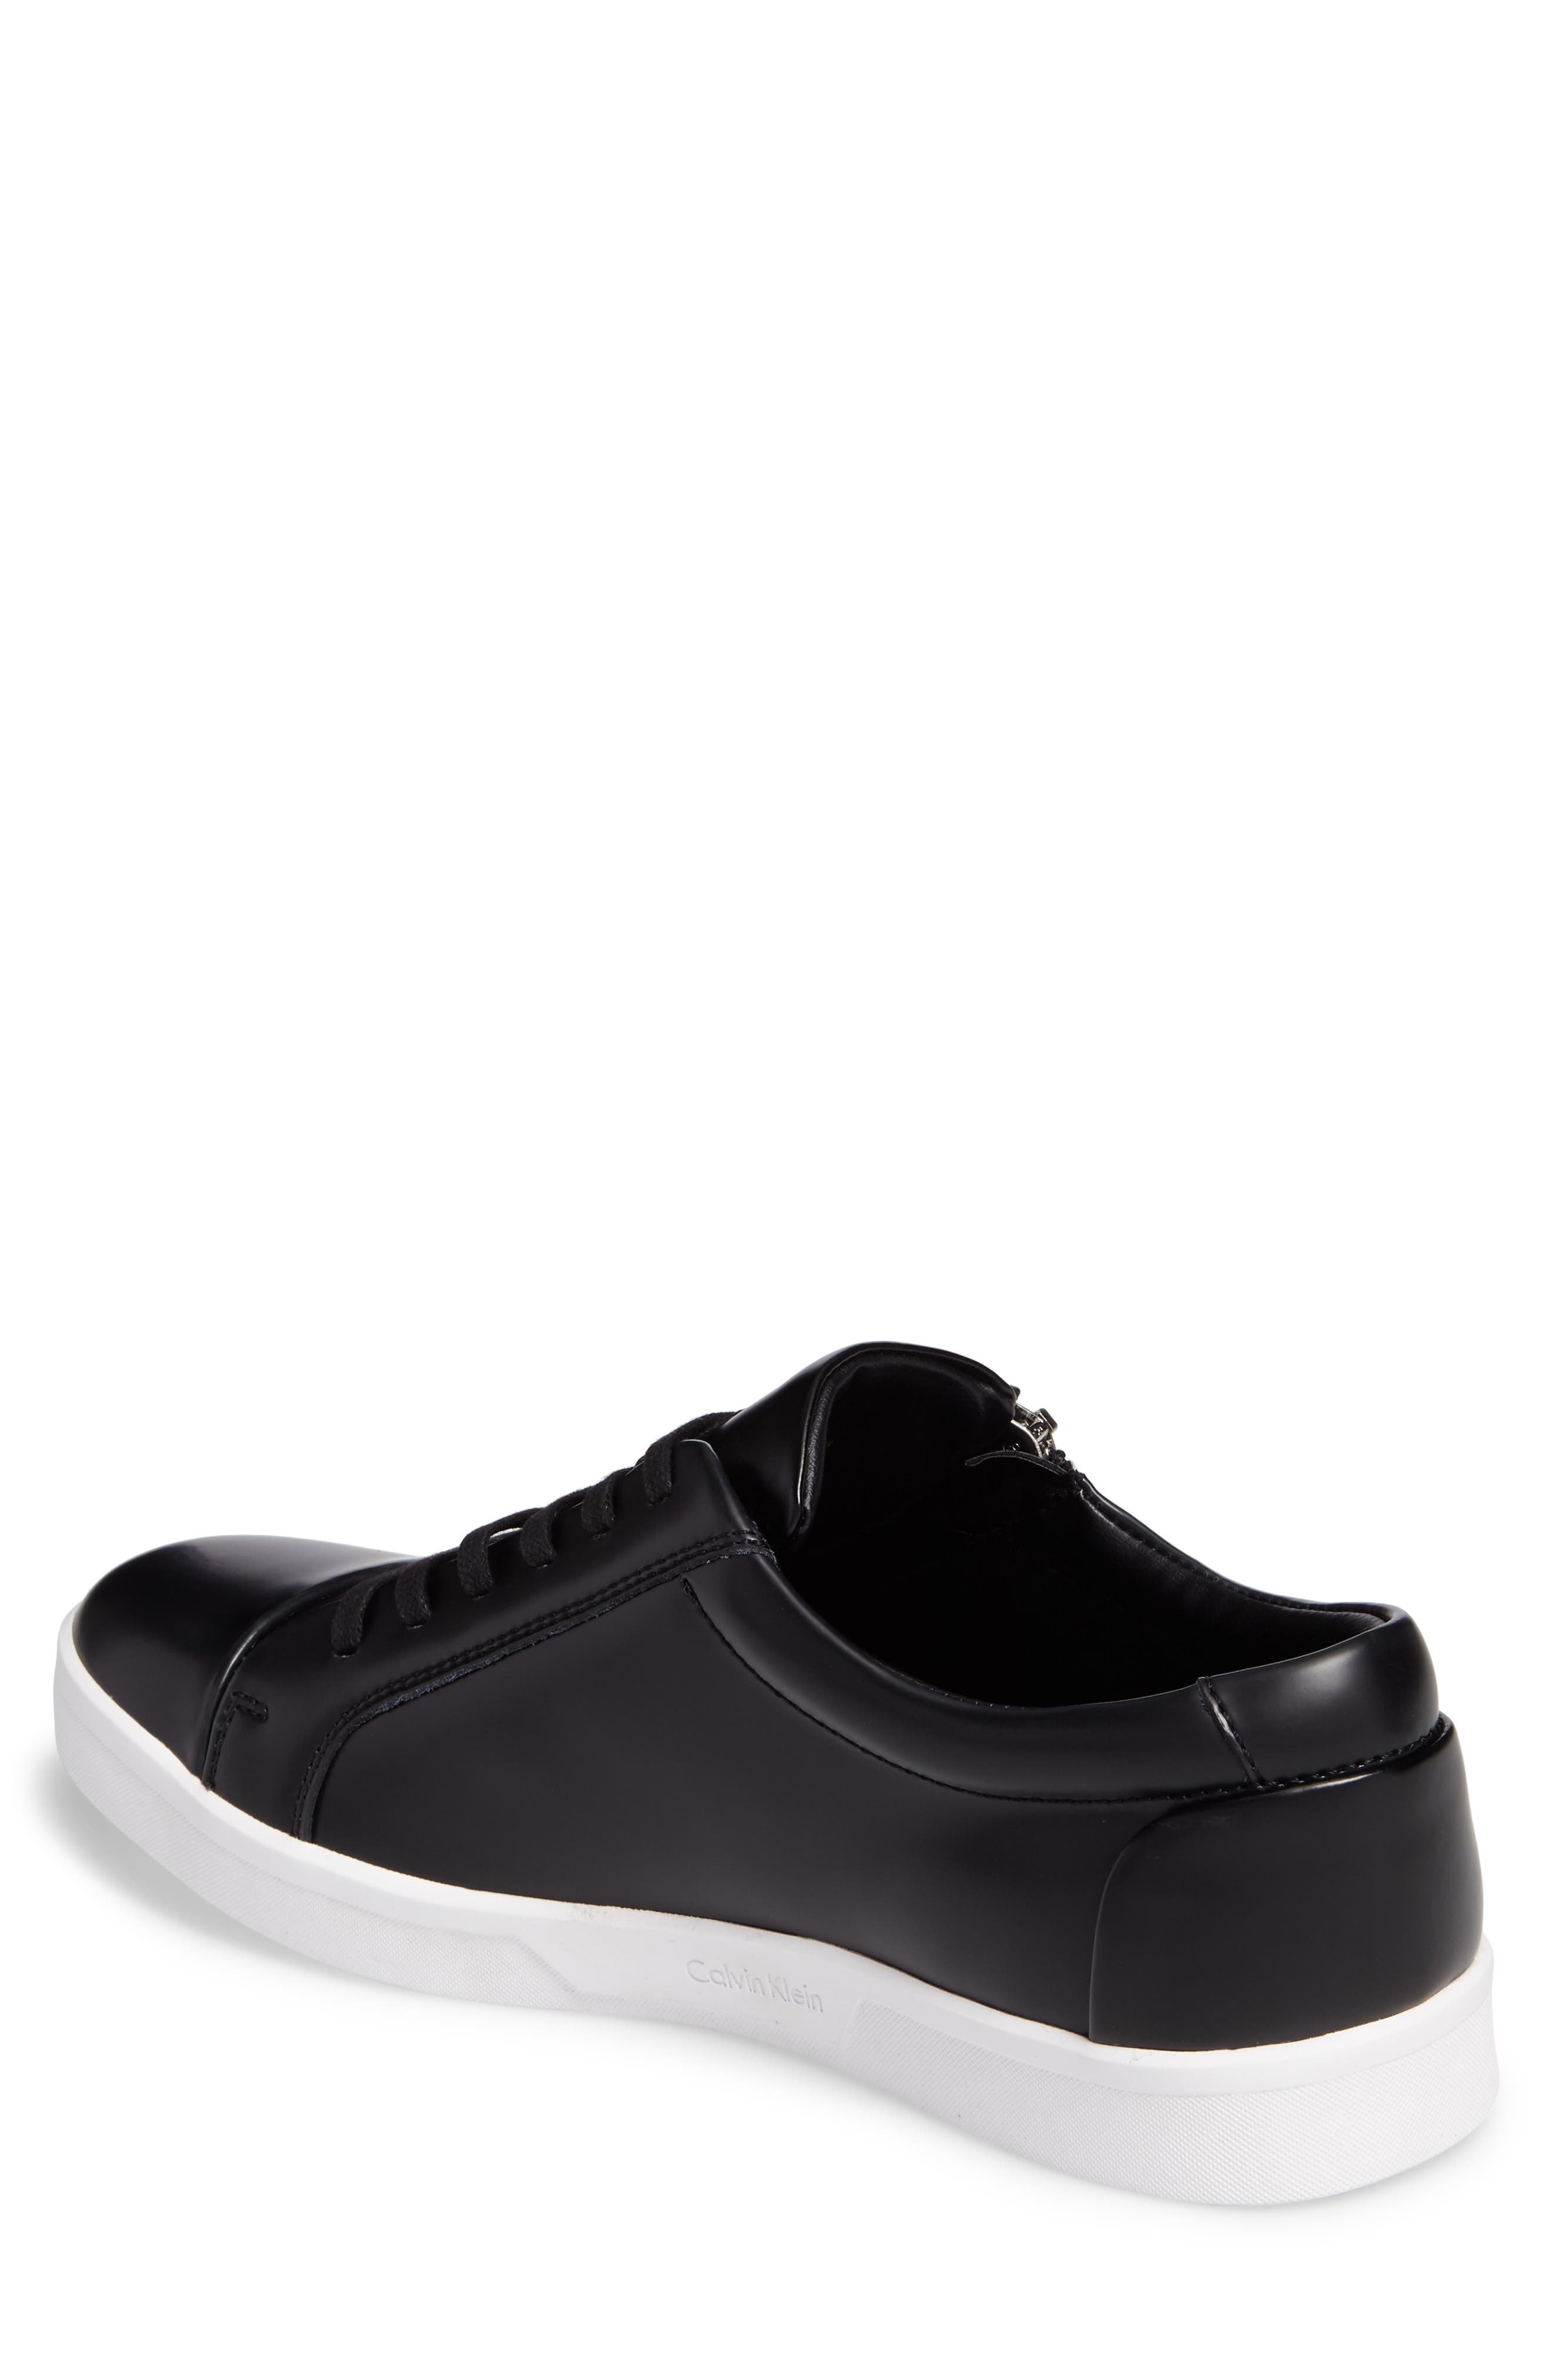 Ibrahim Cap-Toe Zip Sneaker,                             Alternate thumbnail 2, color,                             Black Leather